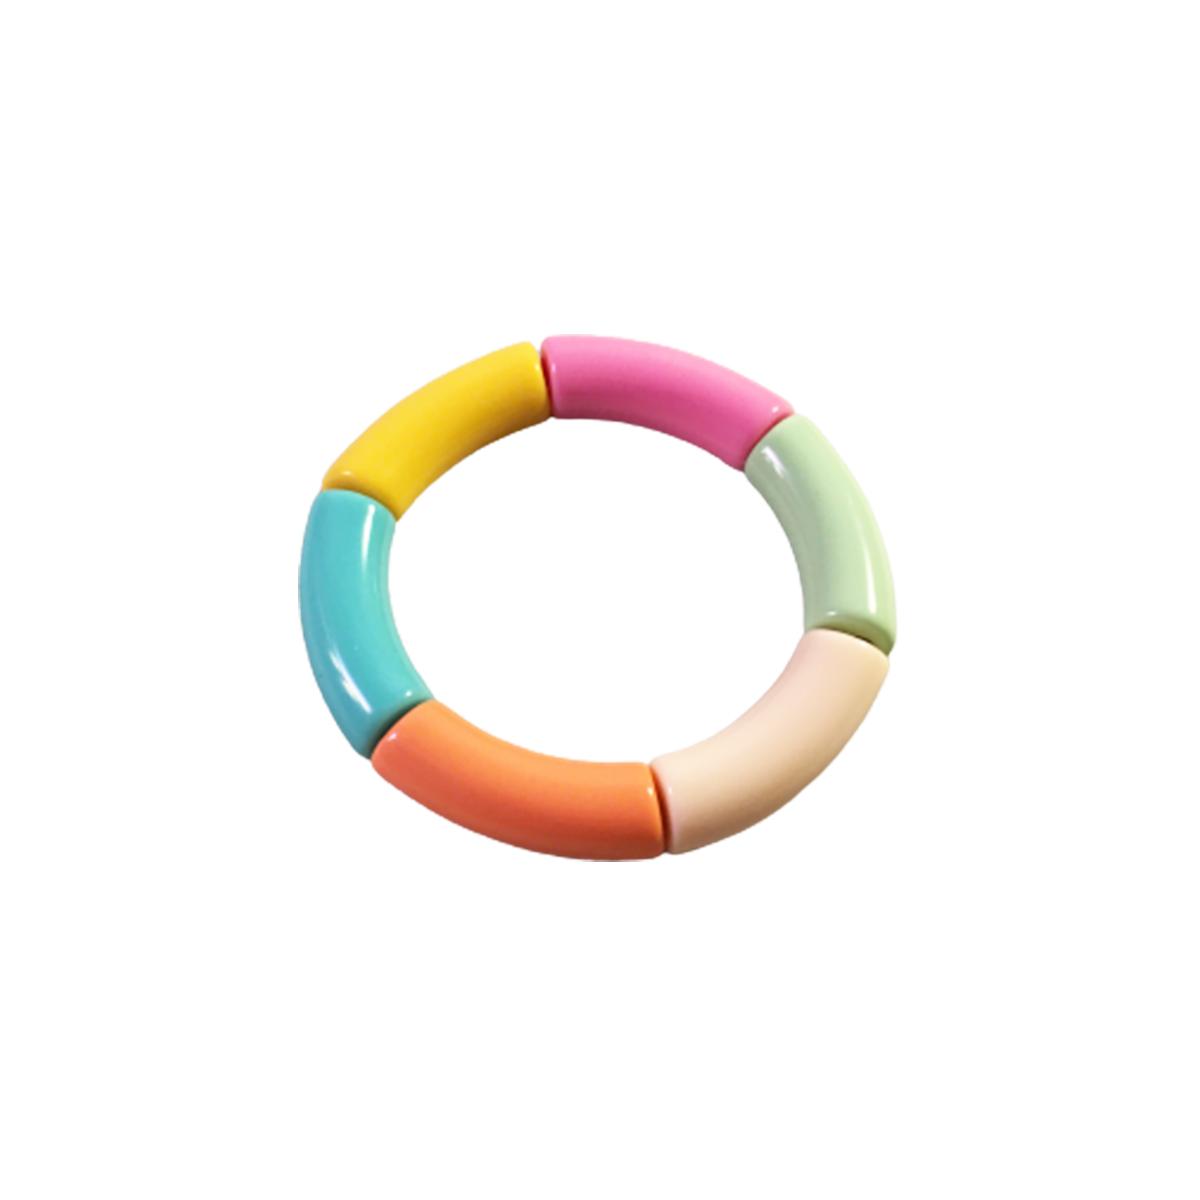 Pulseira Bracelete Feminino Color Acrílico Moda